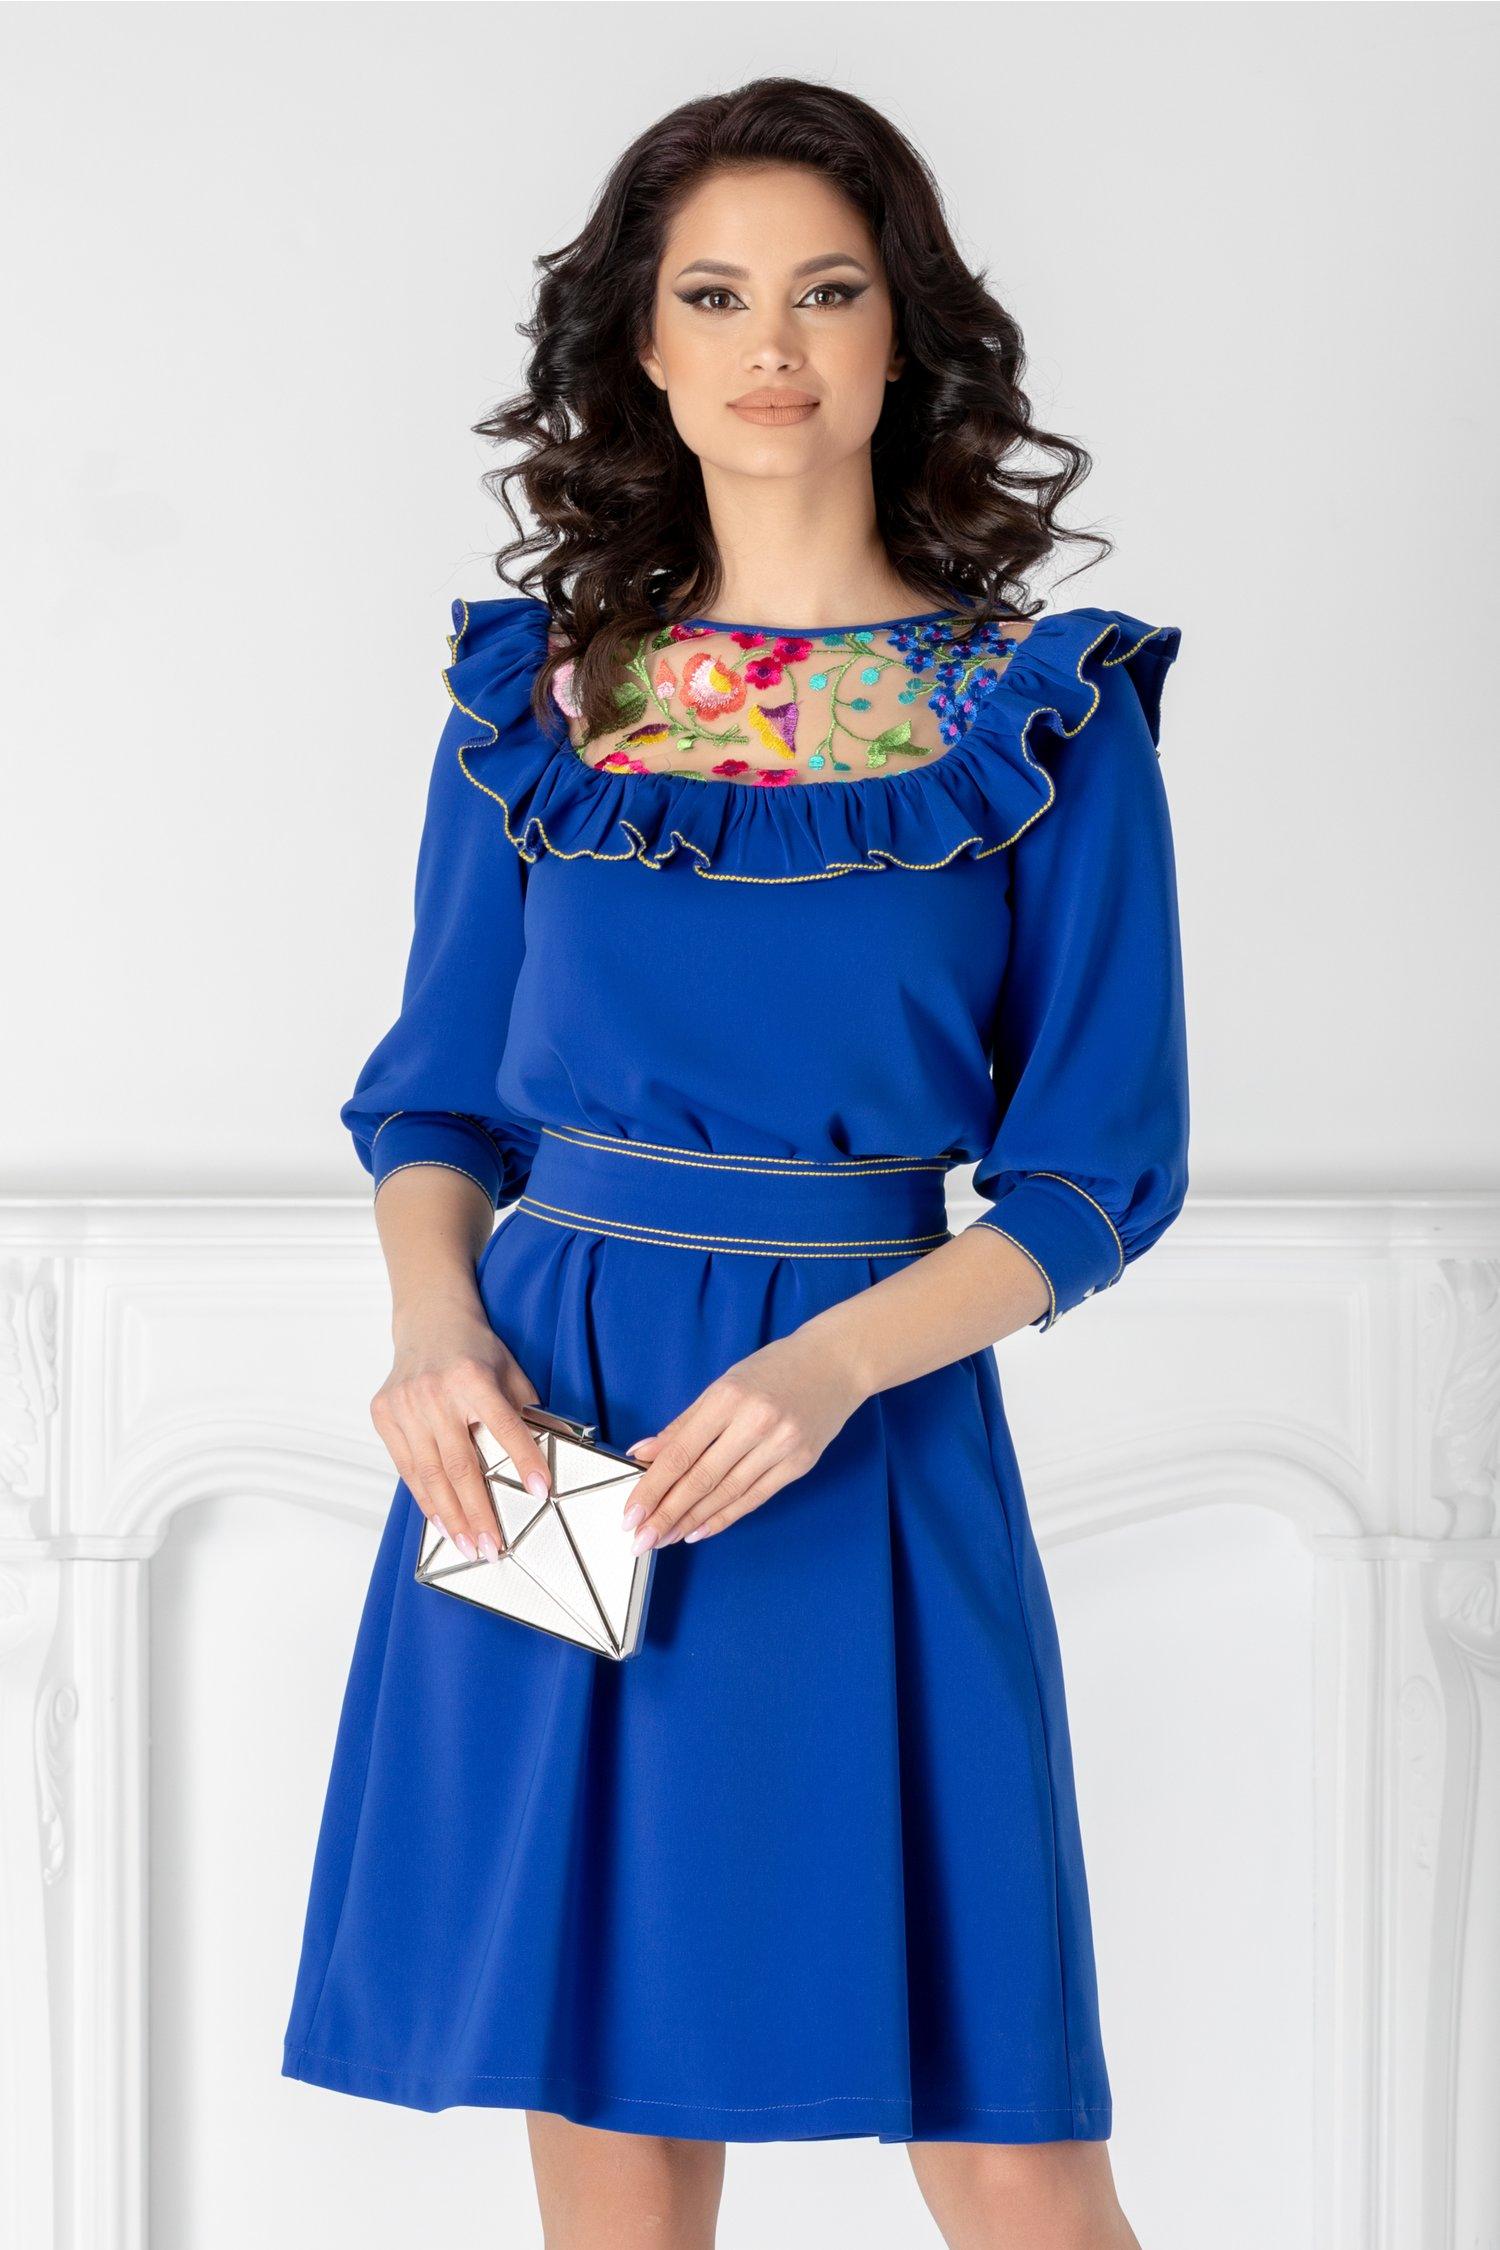 Rochie scurta eleganta albastra de ocazie cu broderie colorata si volane la bust LaDonna cu maneci trei sferturi